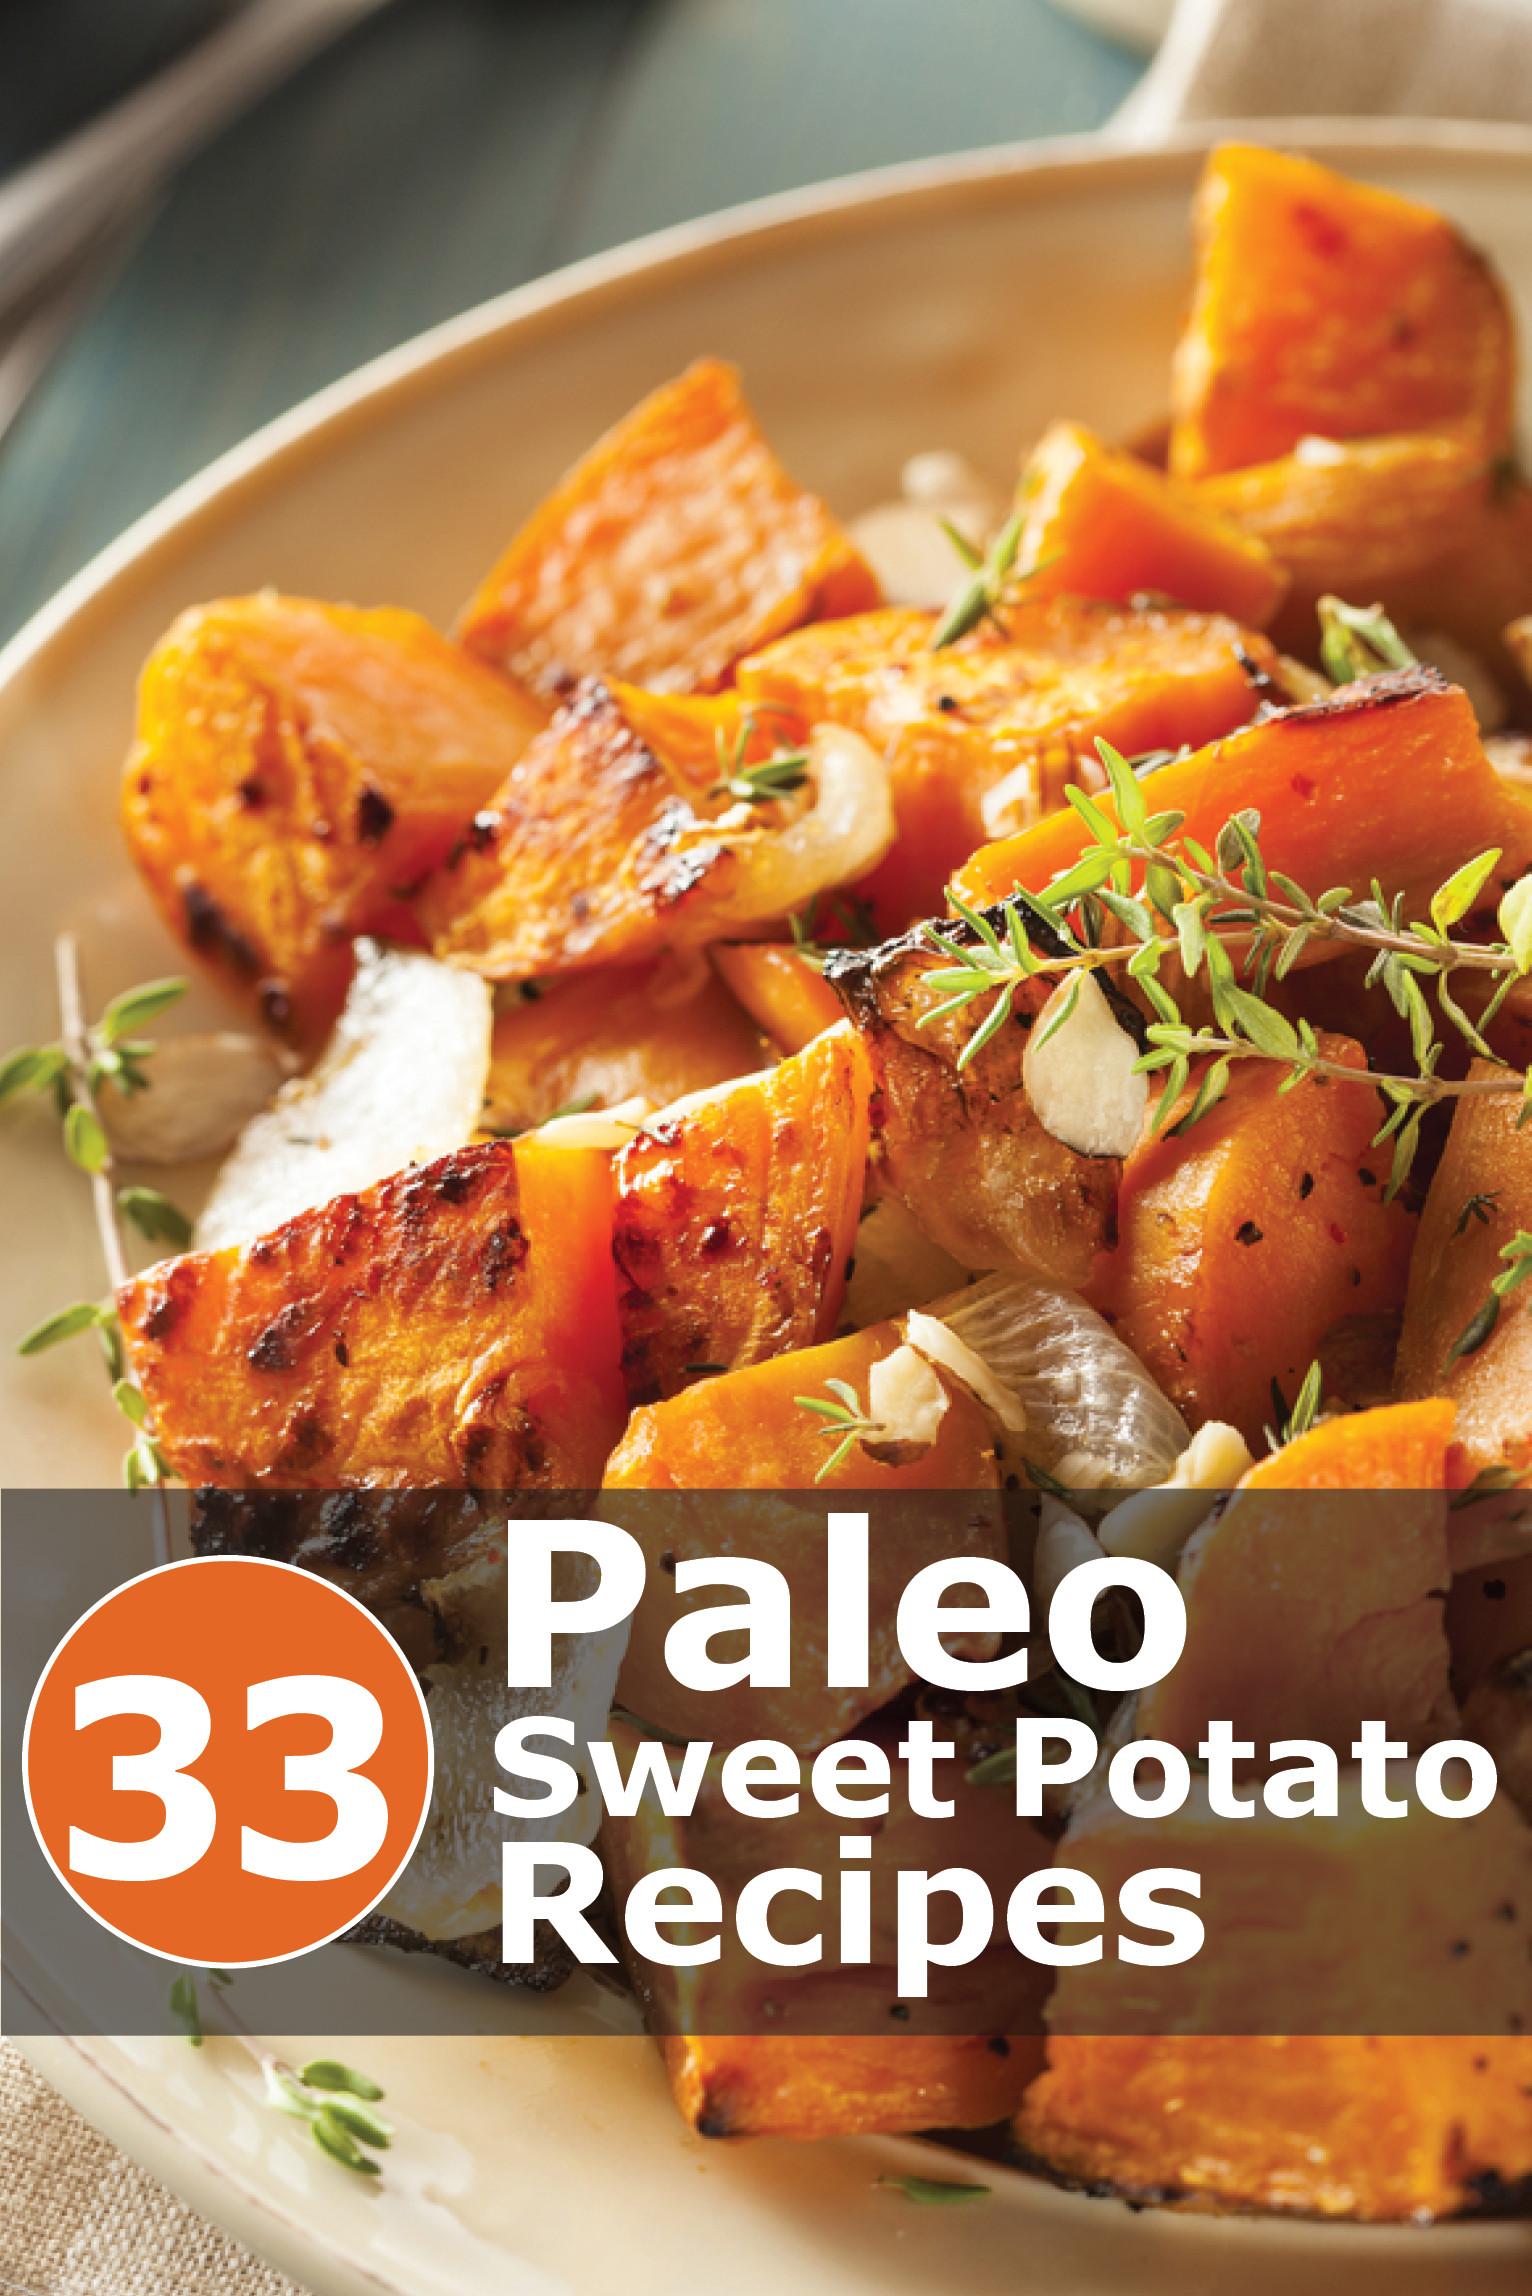 Sweet Potato Meals  33 Paleo Nourishing Sweet Potato Recipes anyone can make